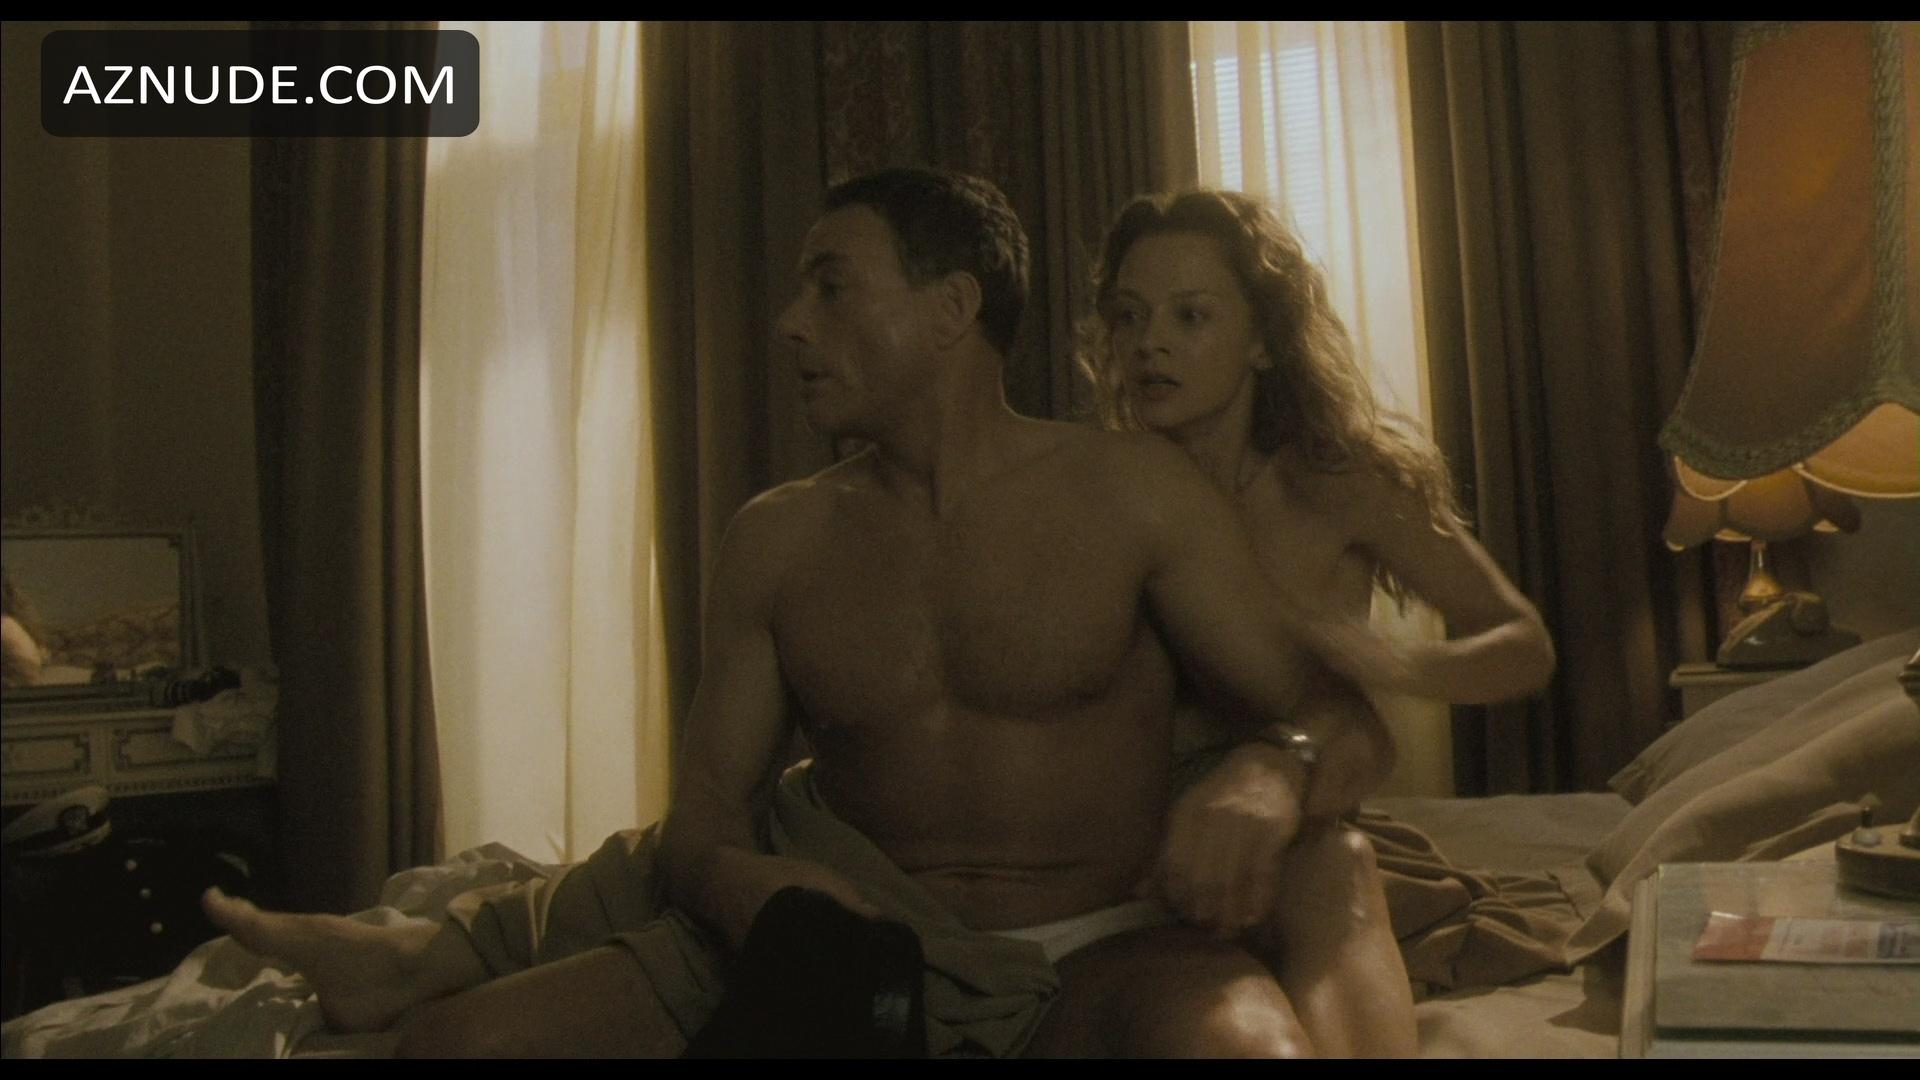 Male celebrity jean claude van damme nude scene